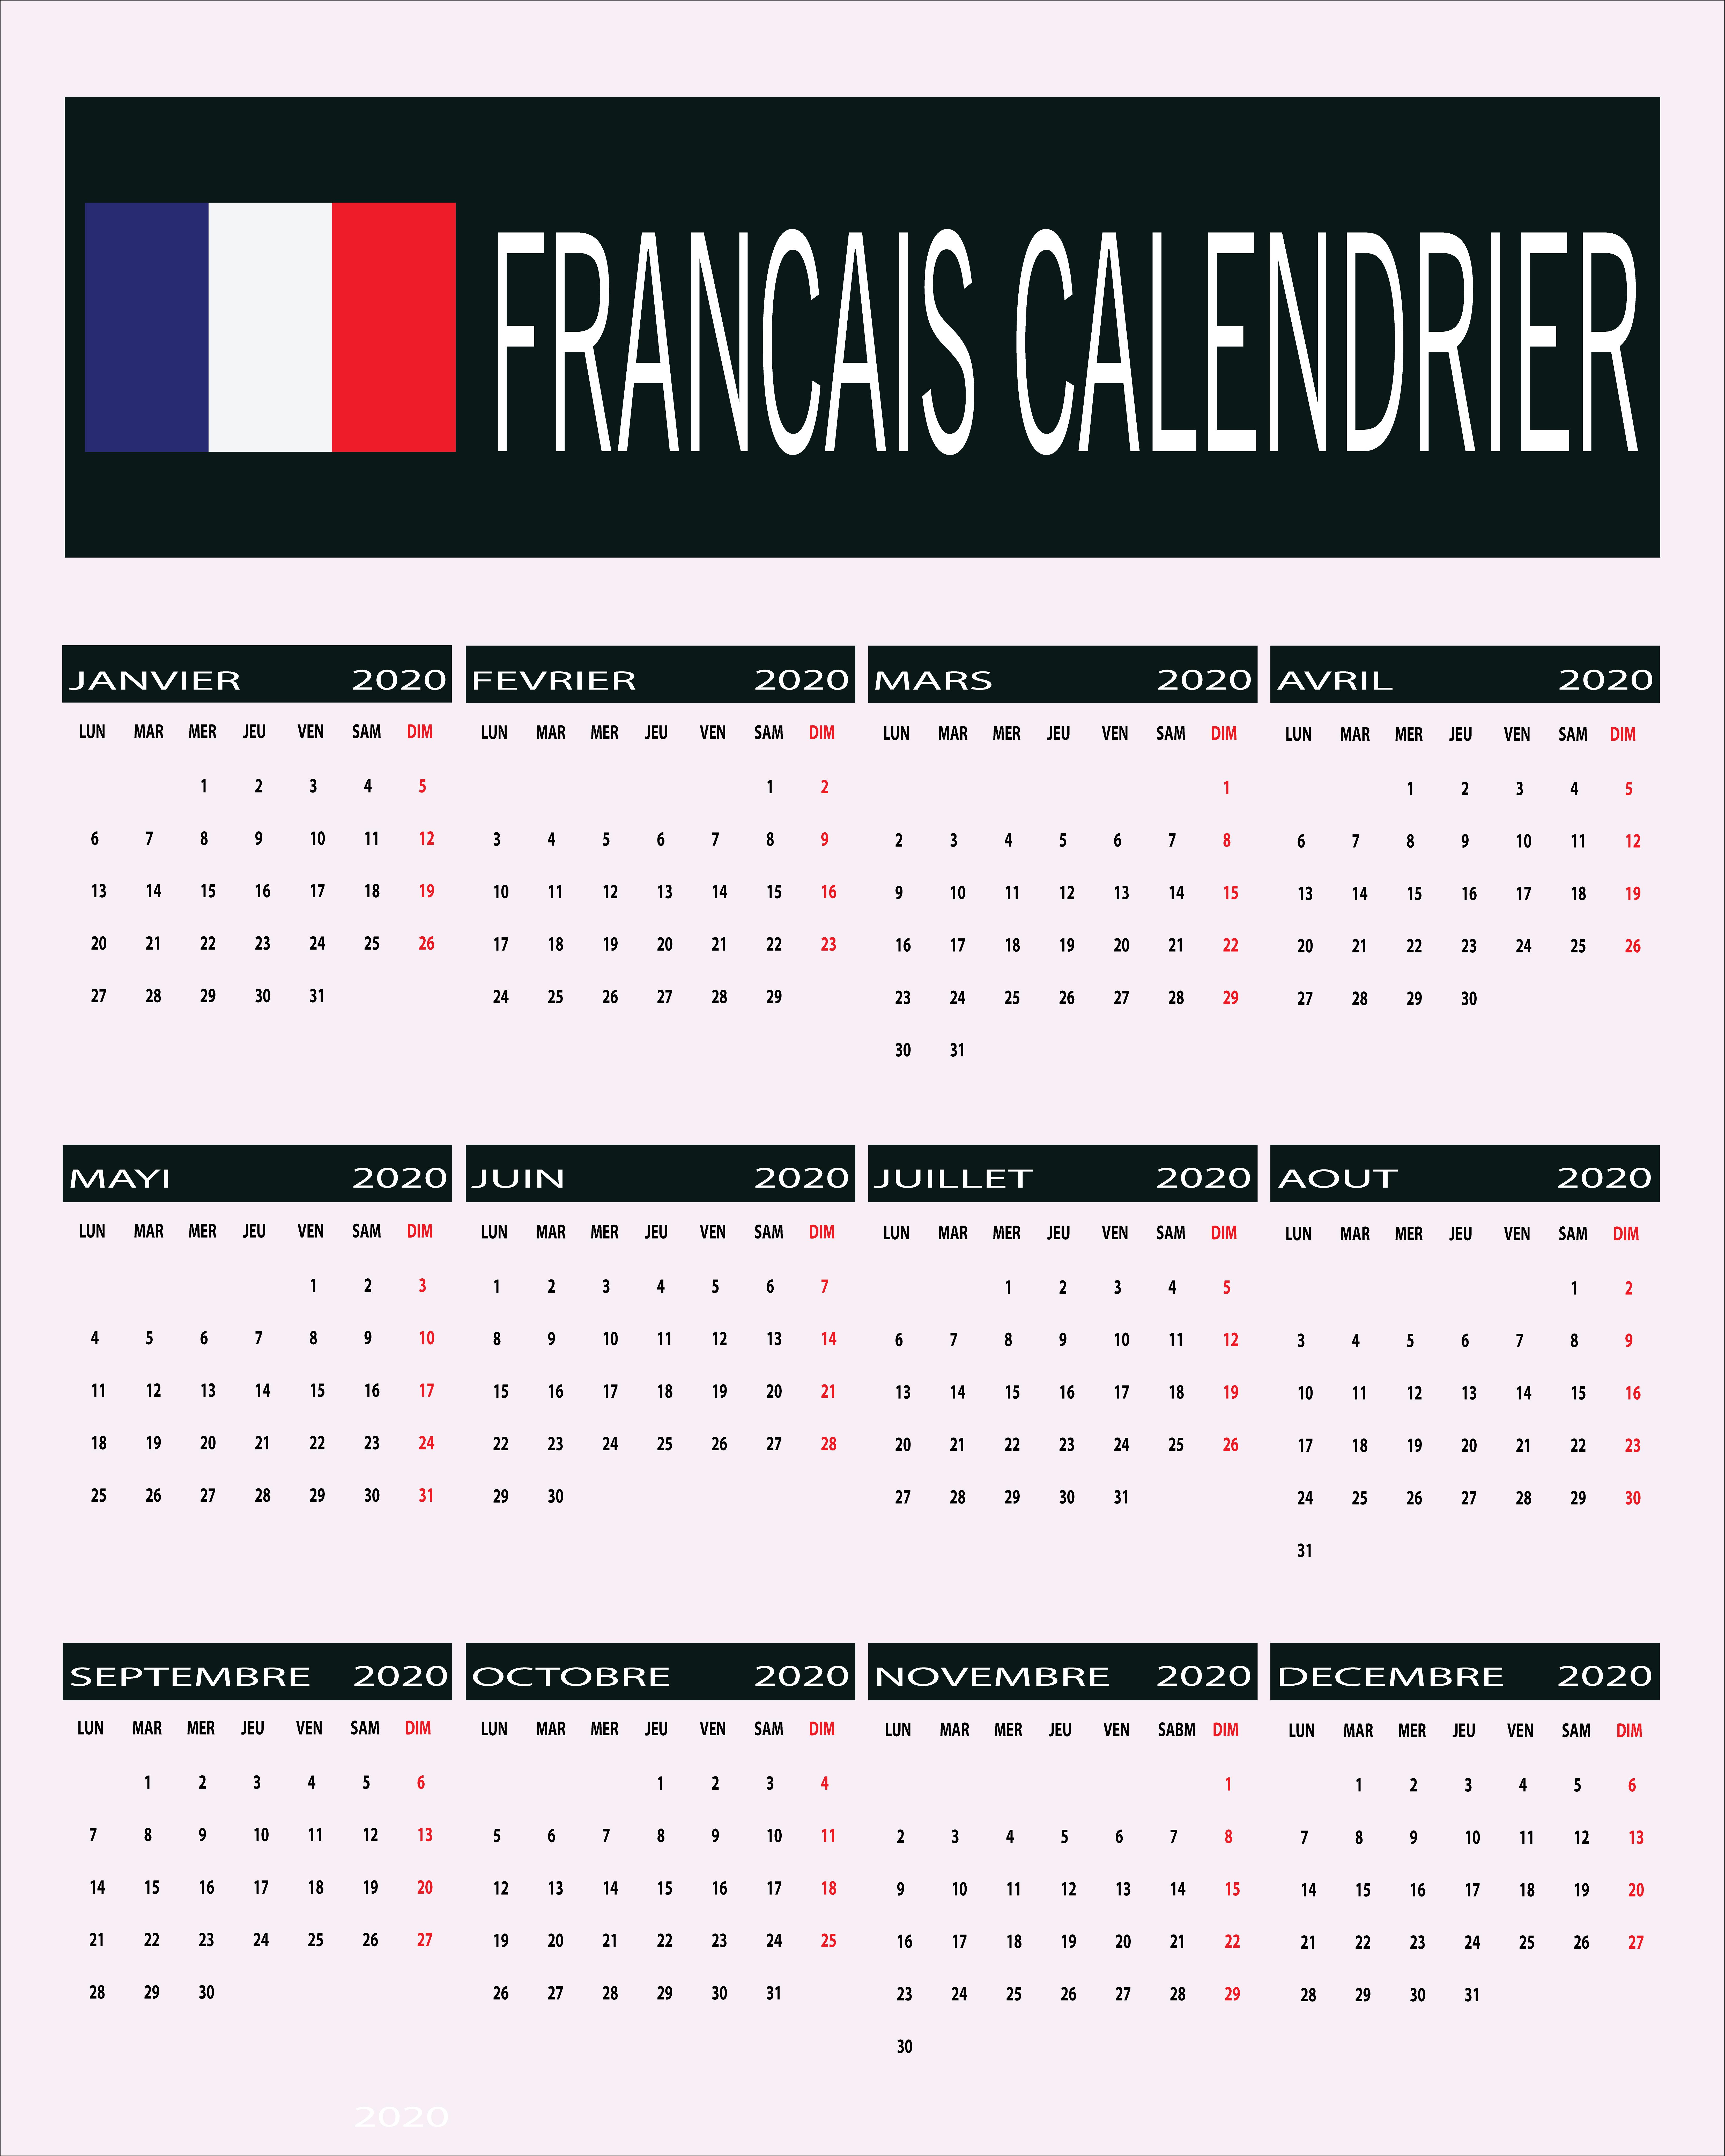 Free Printable French Calendar 2020| 2020 Calendrier